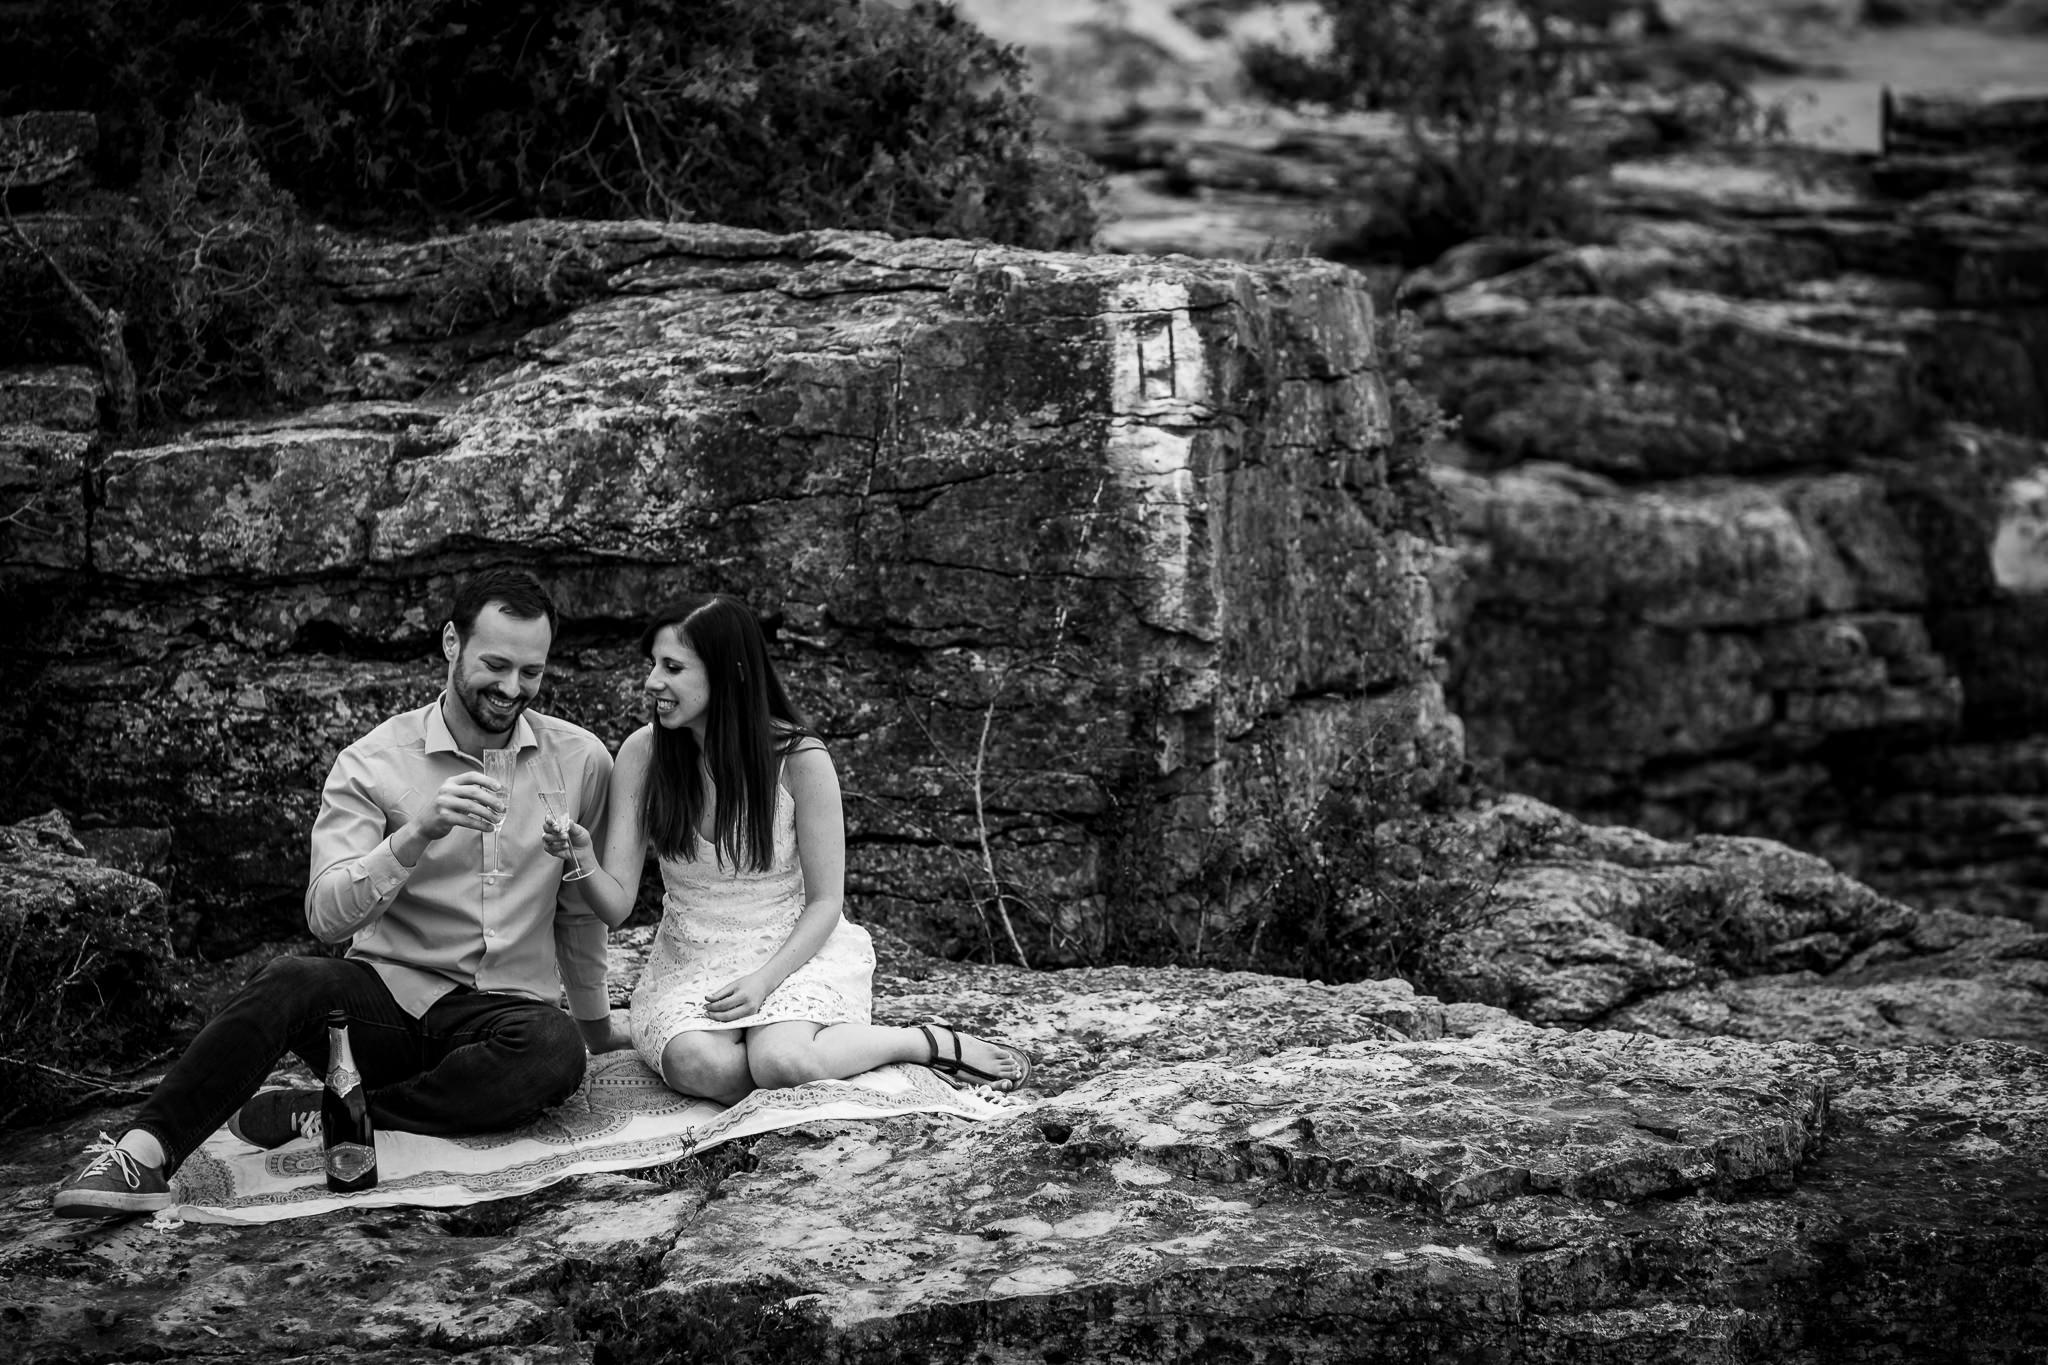 tobermory-engagement-photos-26.jpg